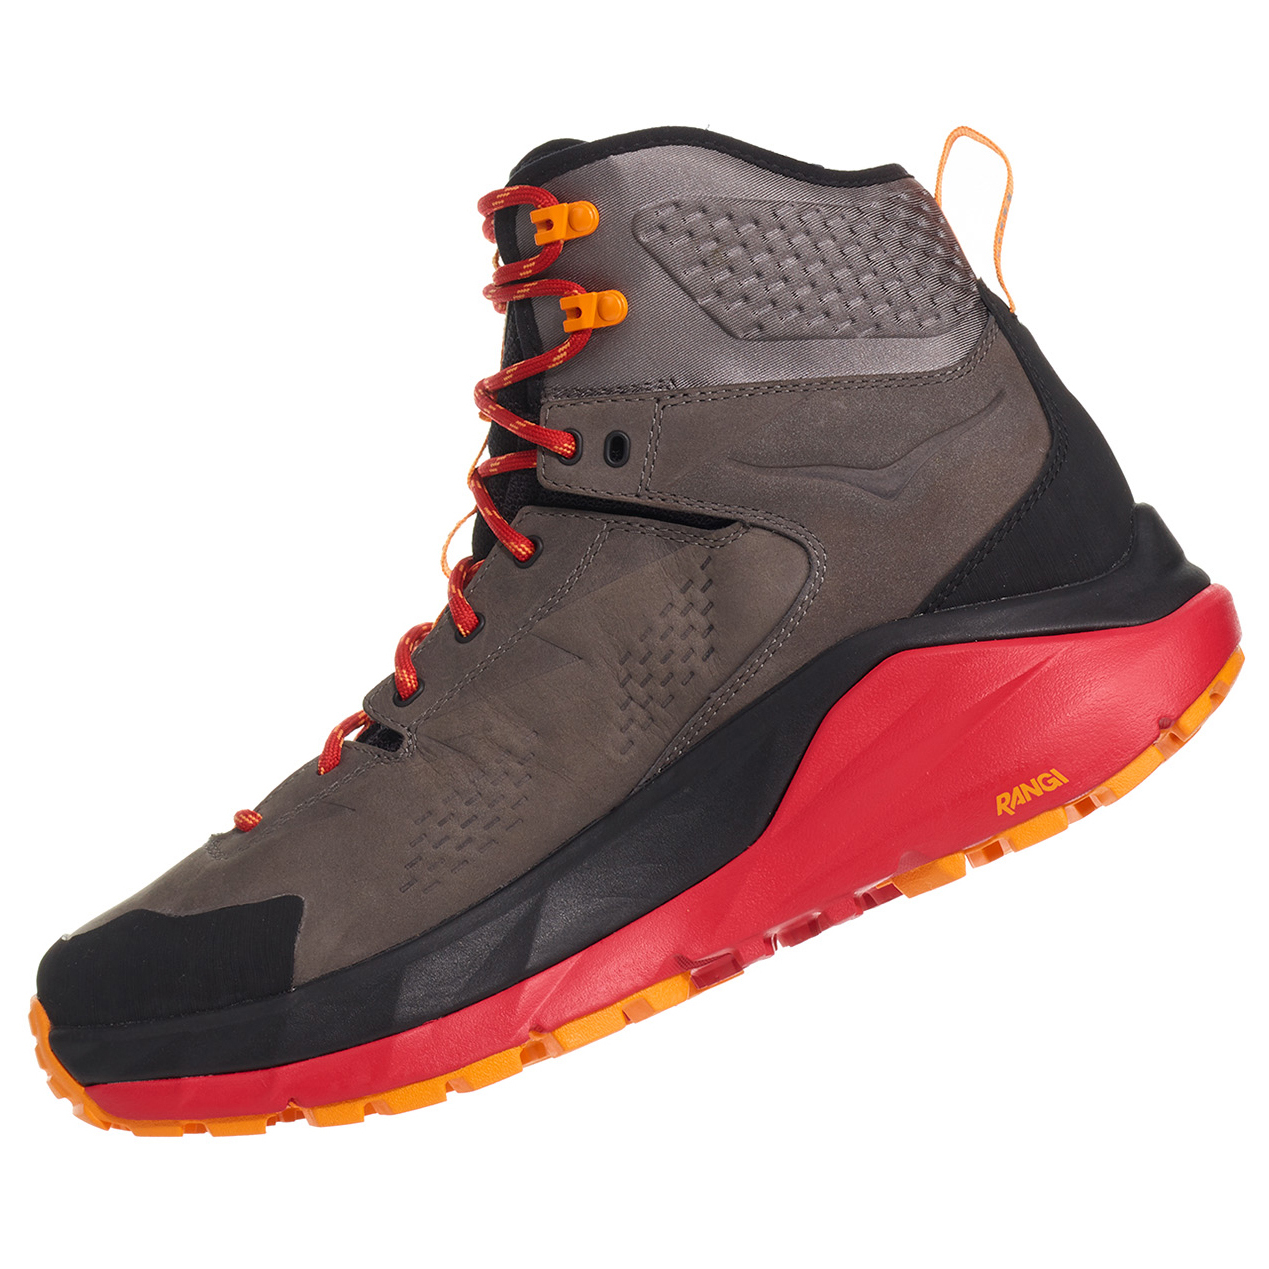 2ba523c37ec ... Hoka One One - Sky Kaha - Chaussures de randonnée ...